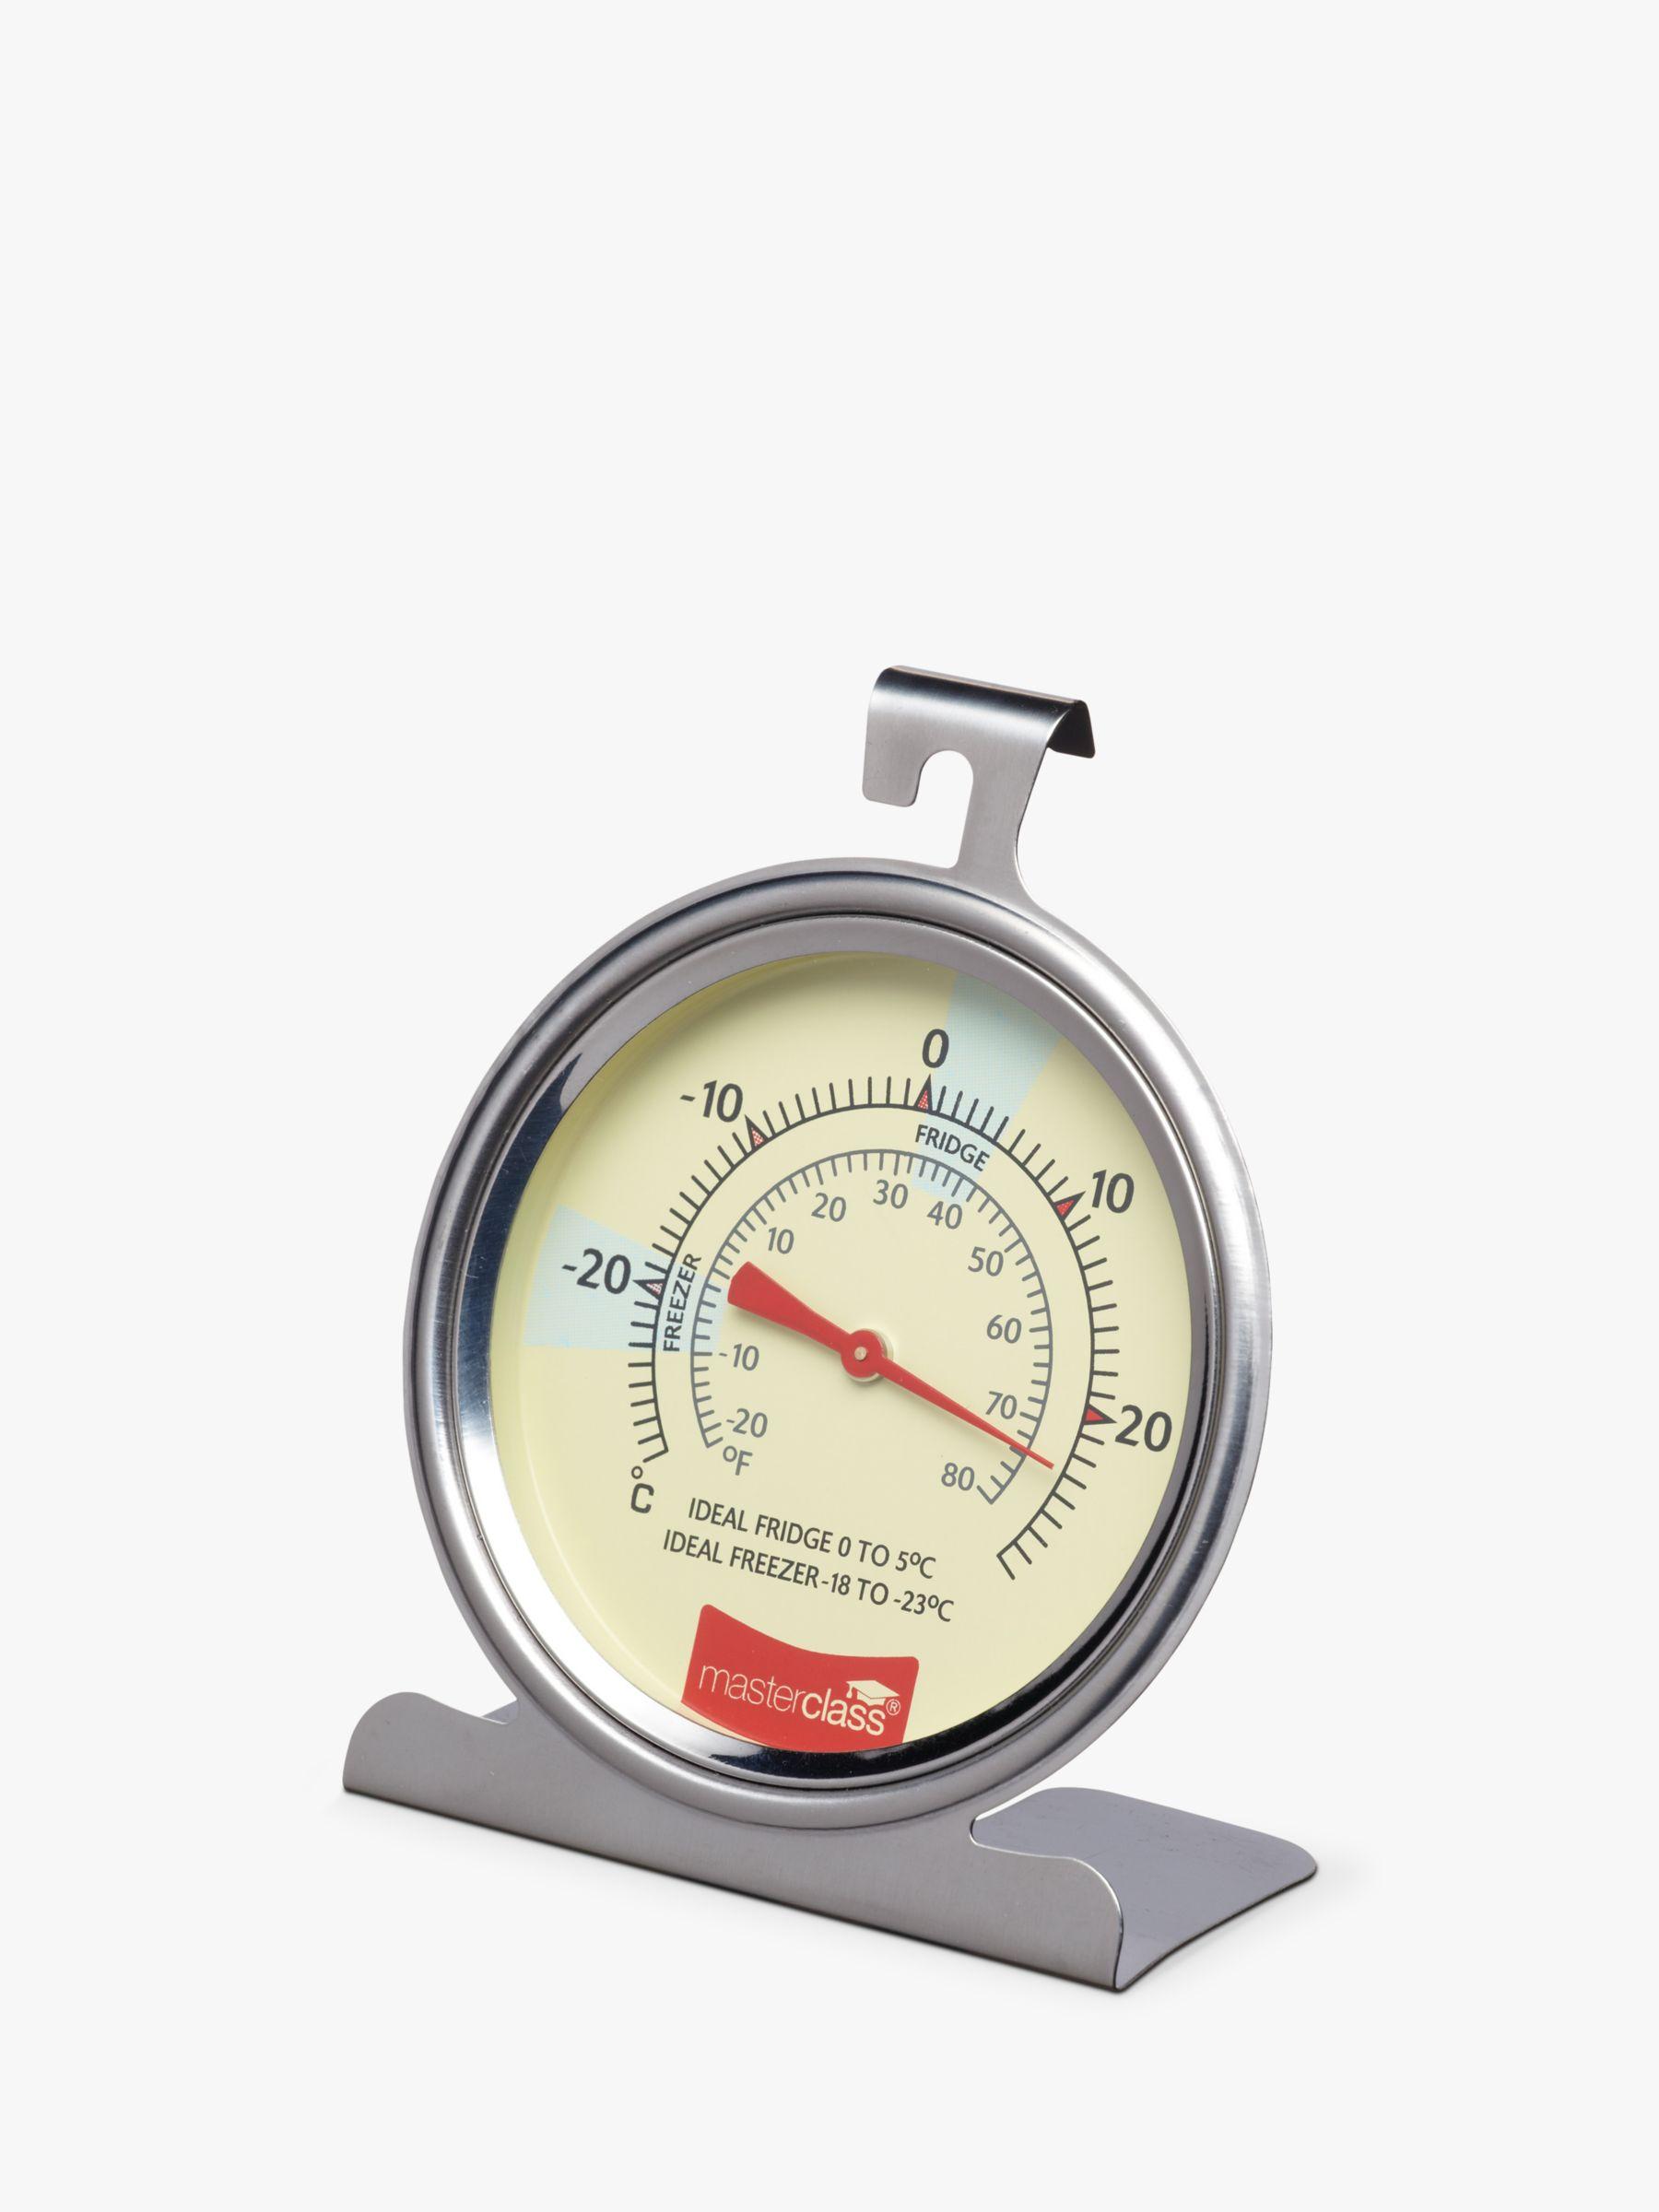 Masterclass Masterclass Stainless Steel Fridge/Freezer Thermometer